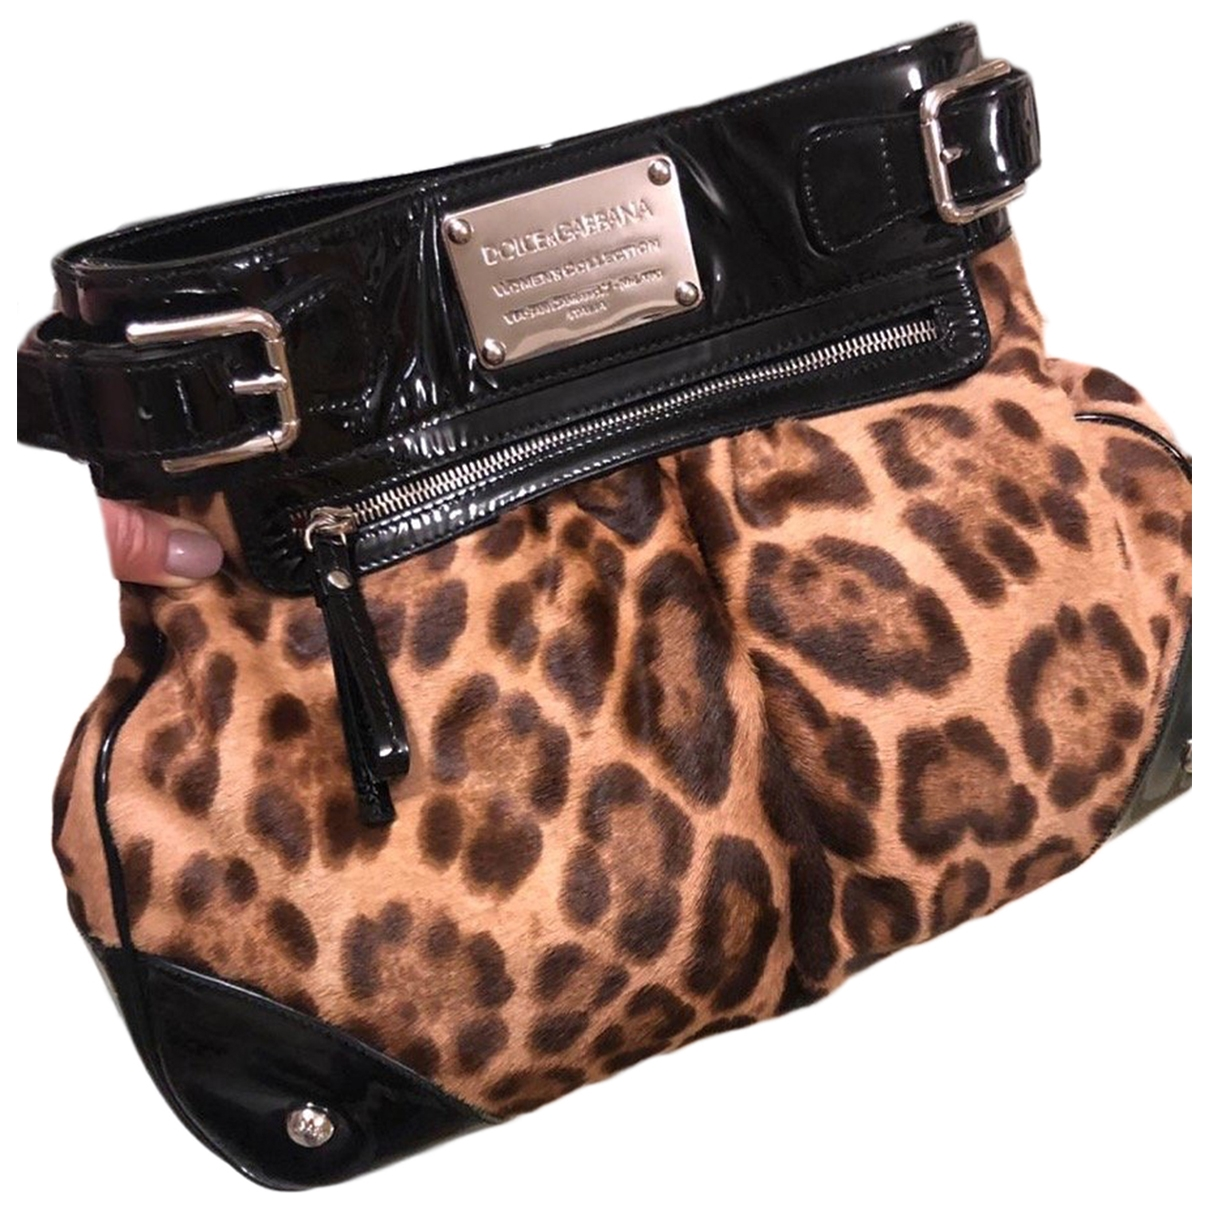 Bolso  de Piel de potro de imitacion Dolce & Gabbana